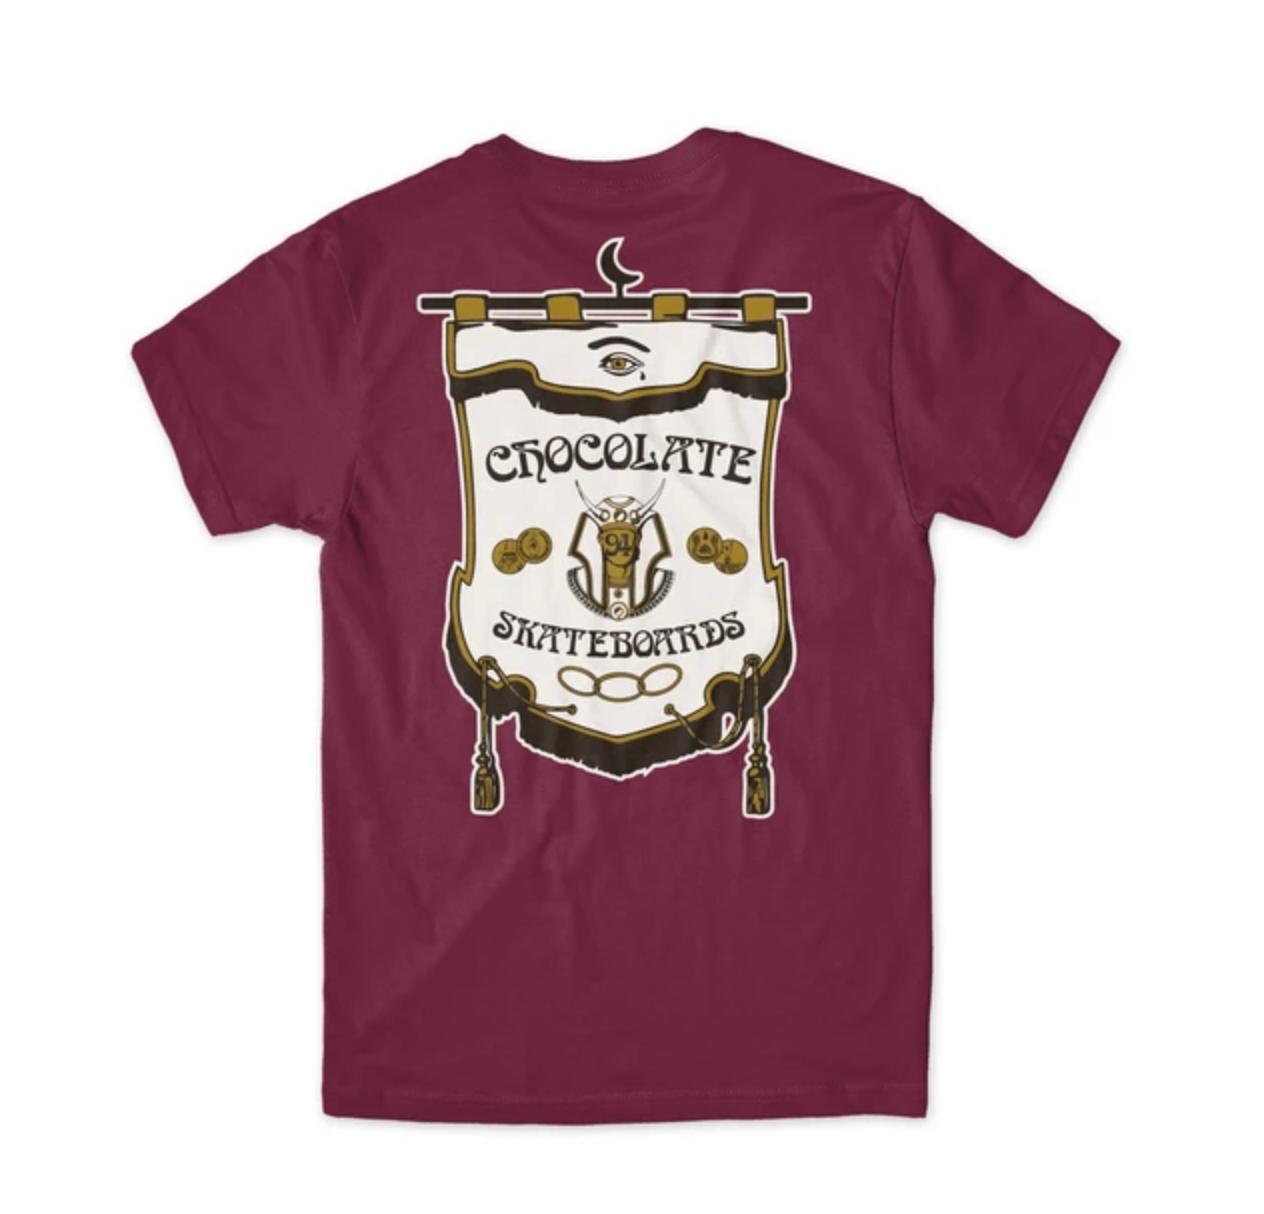 Chocolate Skateboards Secret Society Burgandy Tee